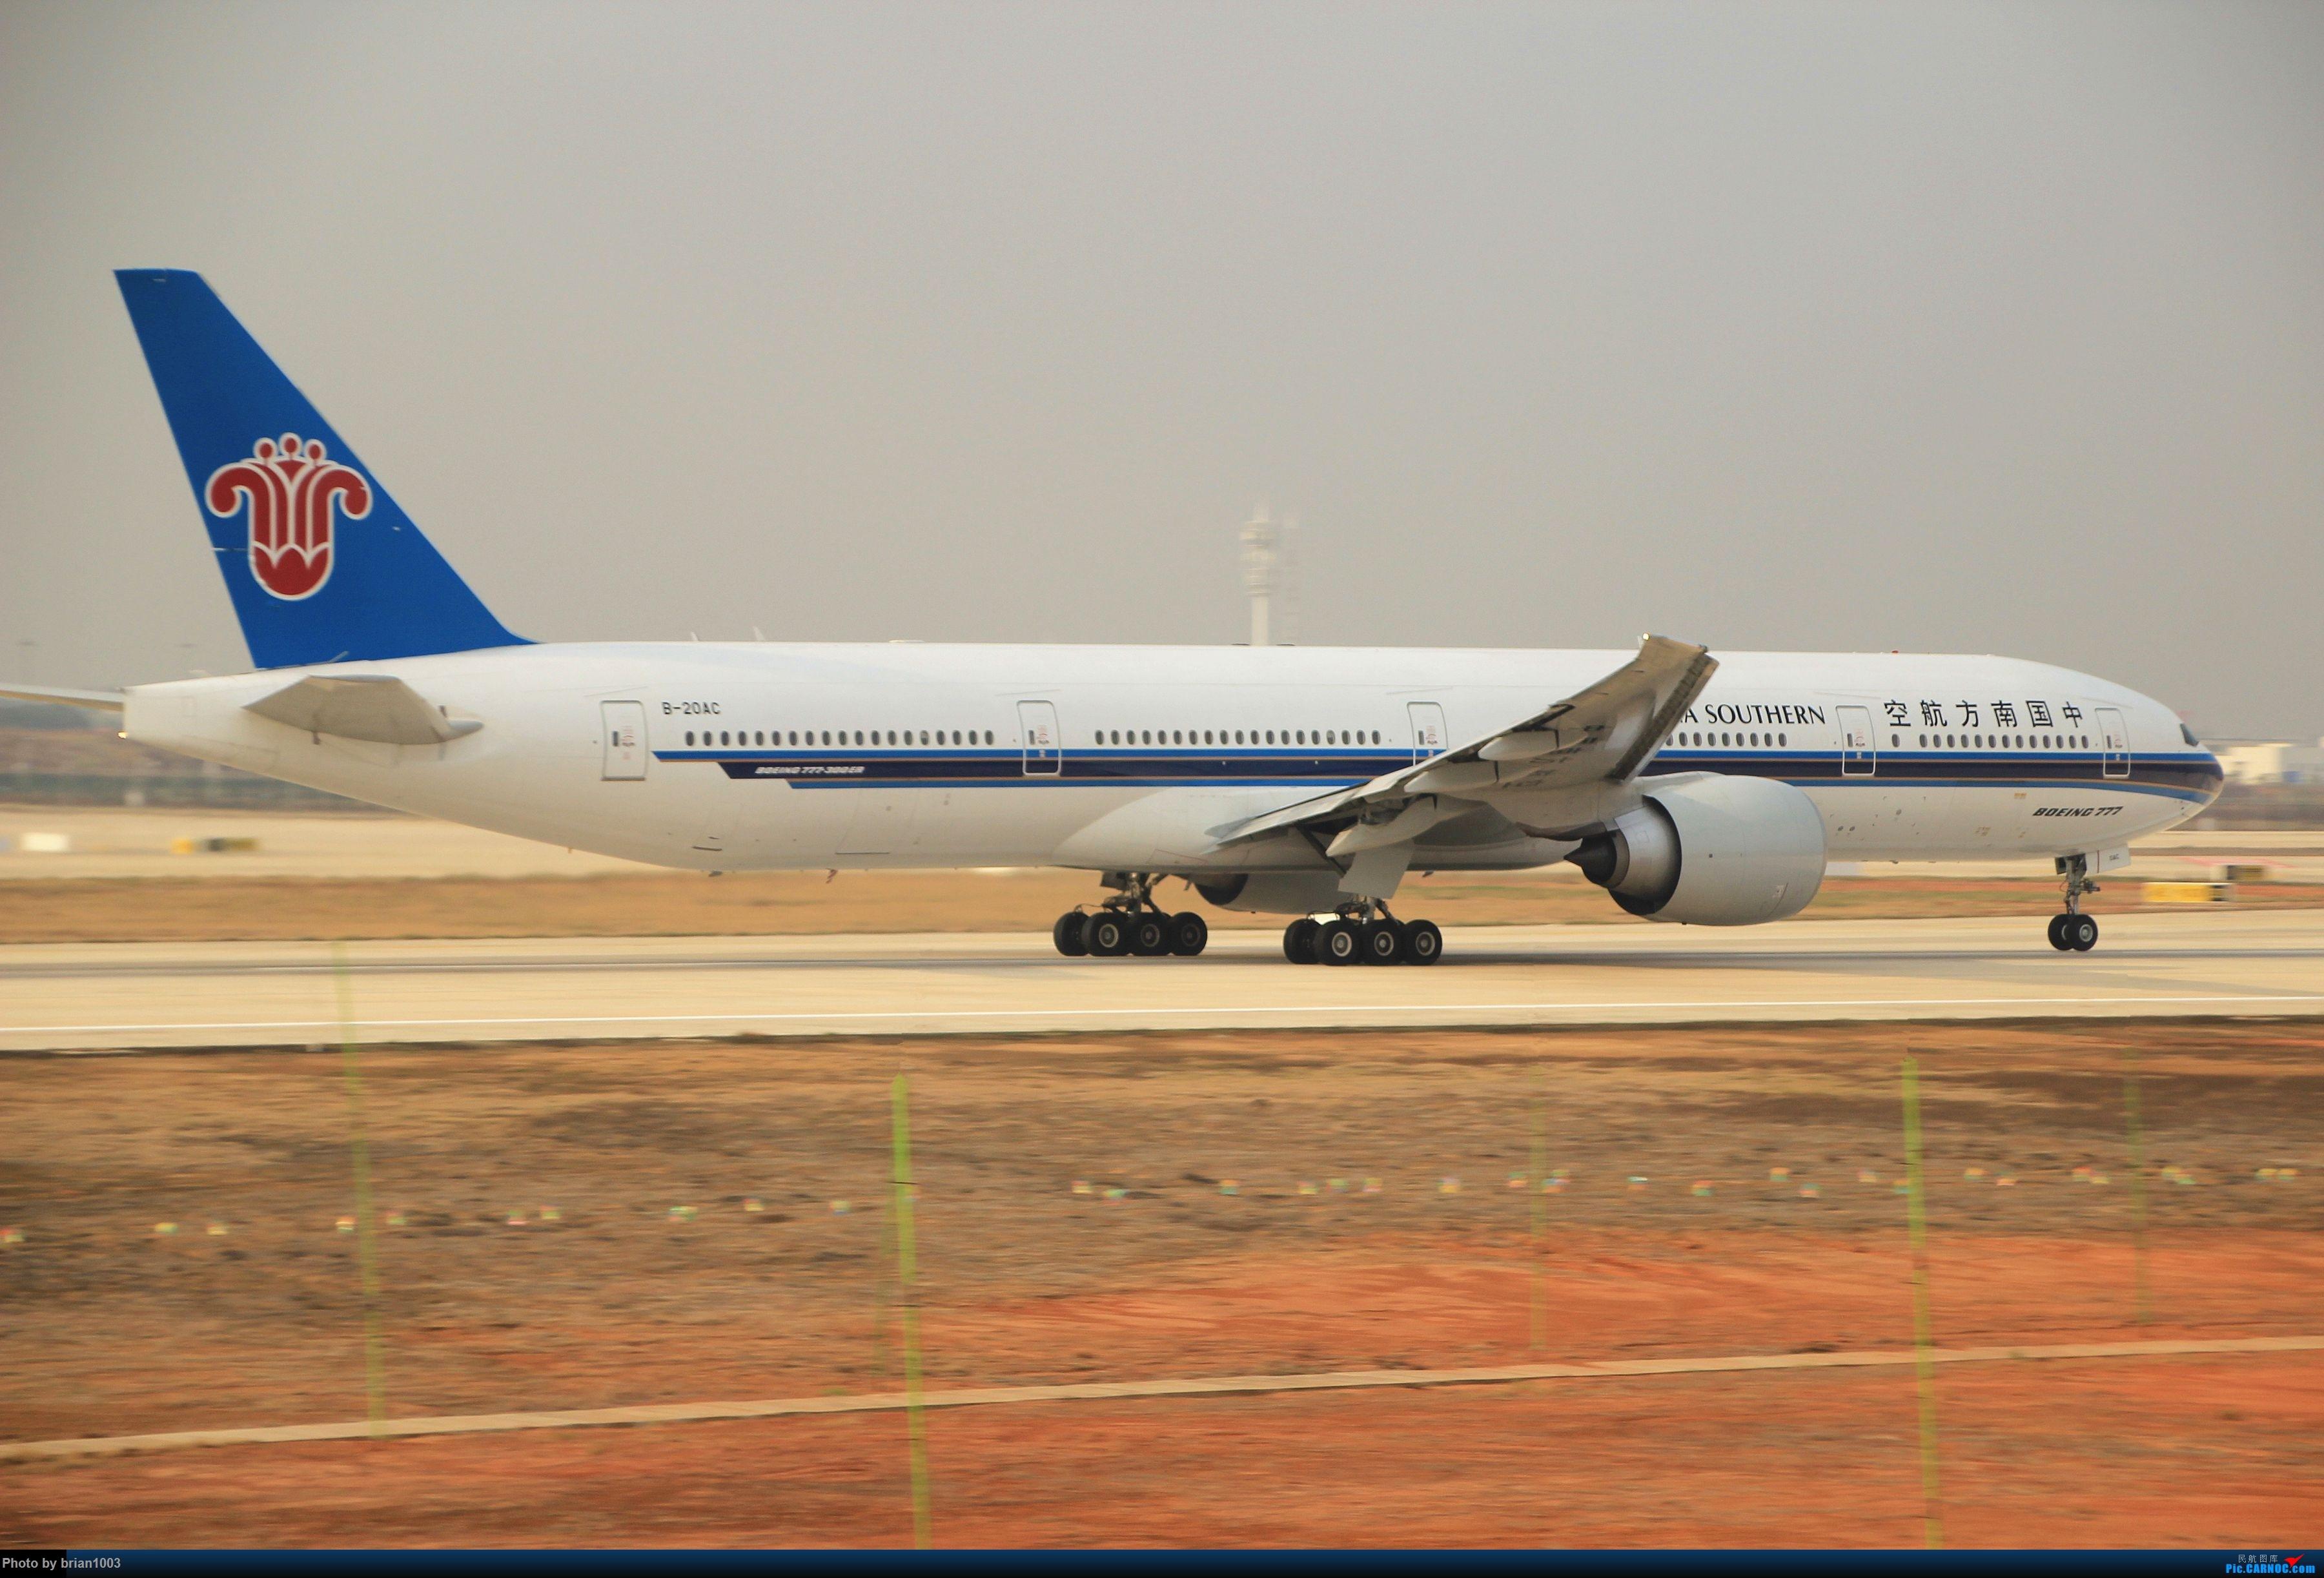 Re:[原创]WUH武汉天河机场拍机之新航季来的海航333、幸福738和南航77W(更新至11月23日) BOEING 777-300ER B-20AC 中国武汉天河国际机场